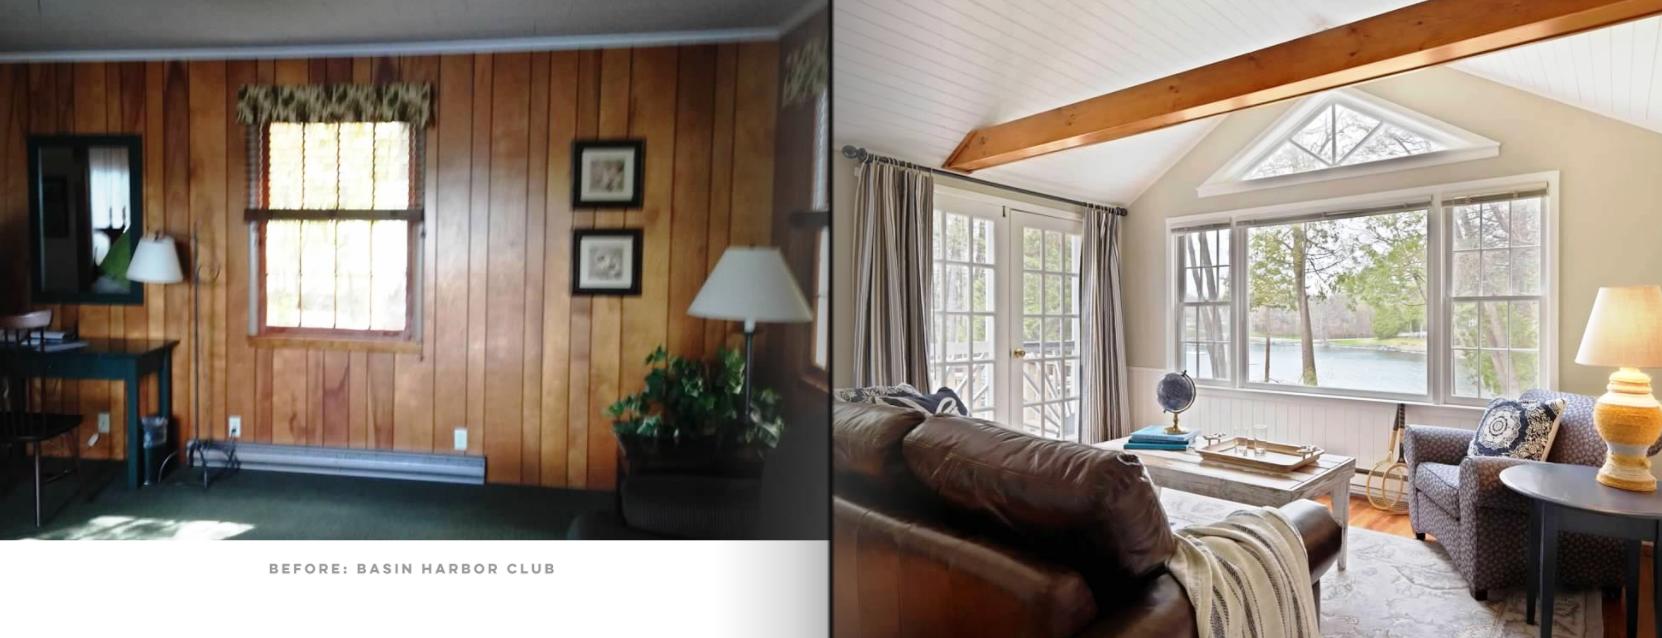 cottage basin harbor club renovation updates interior design by joanne palmisano.png